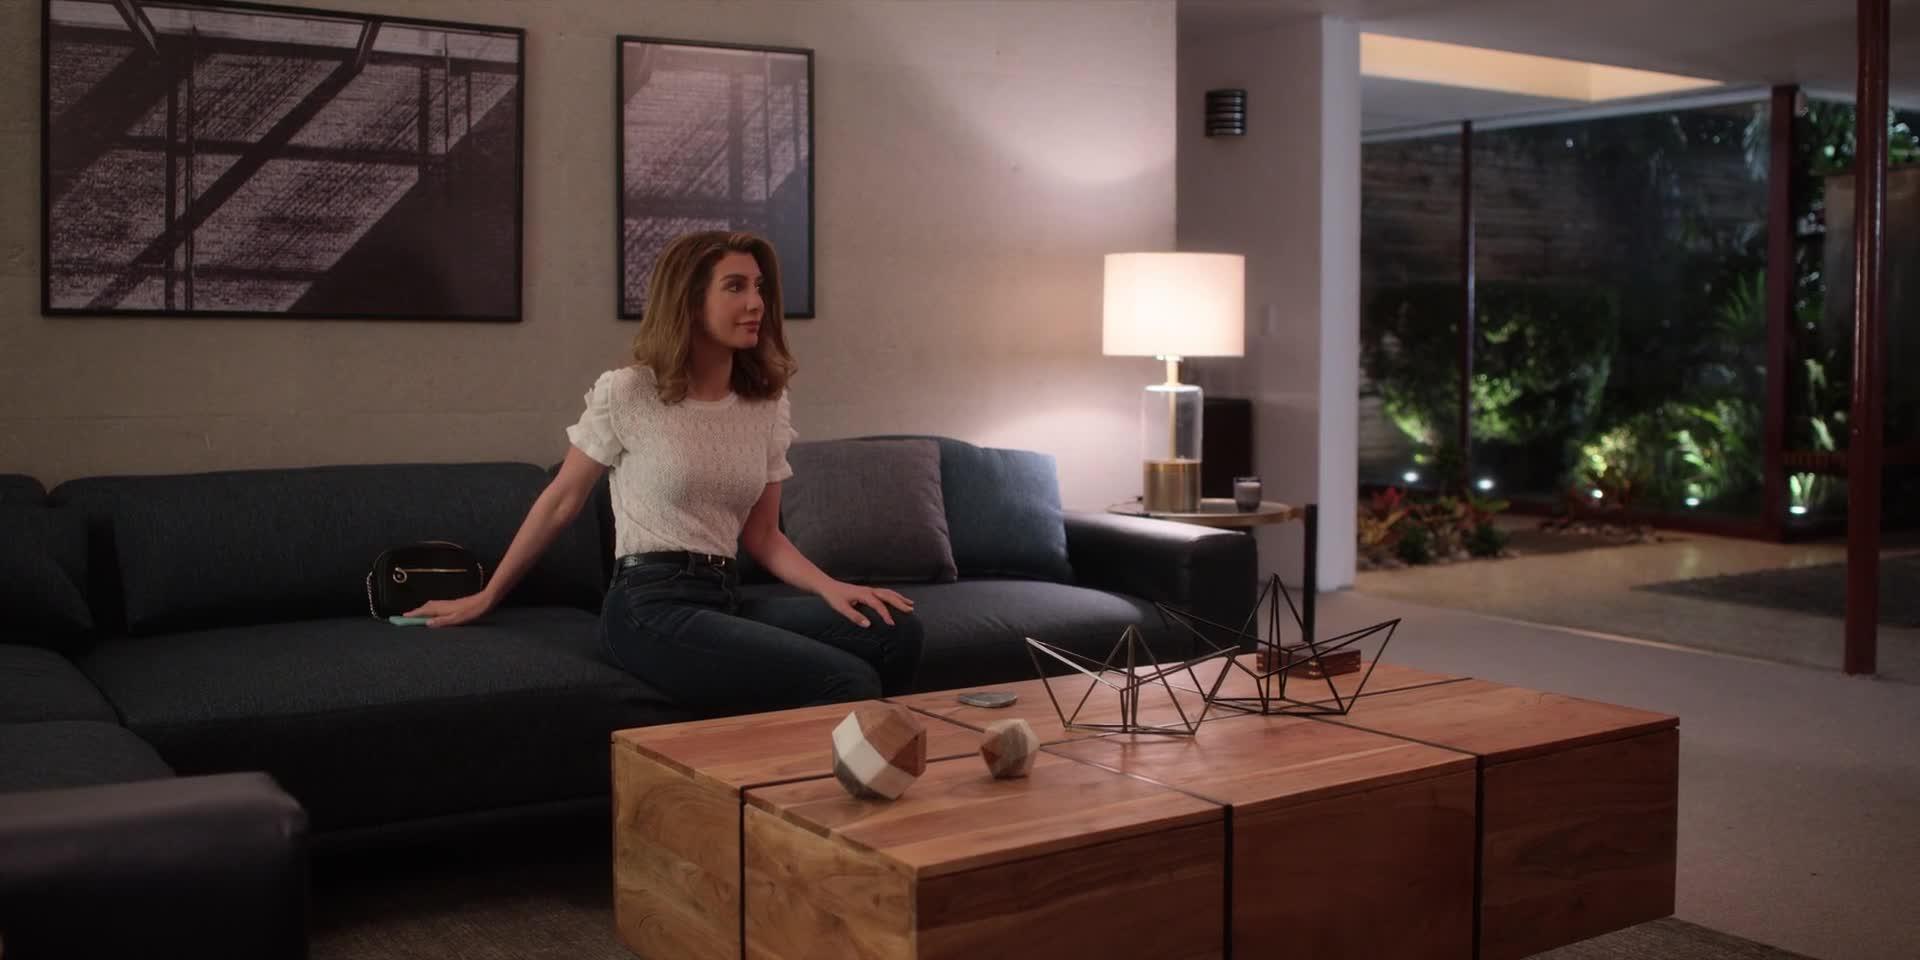 Zoufalky 2020 CZ titulky HD 1080p